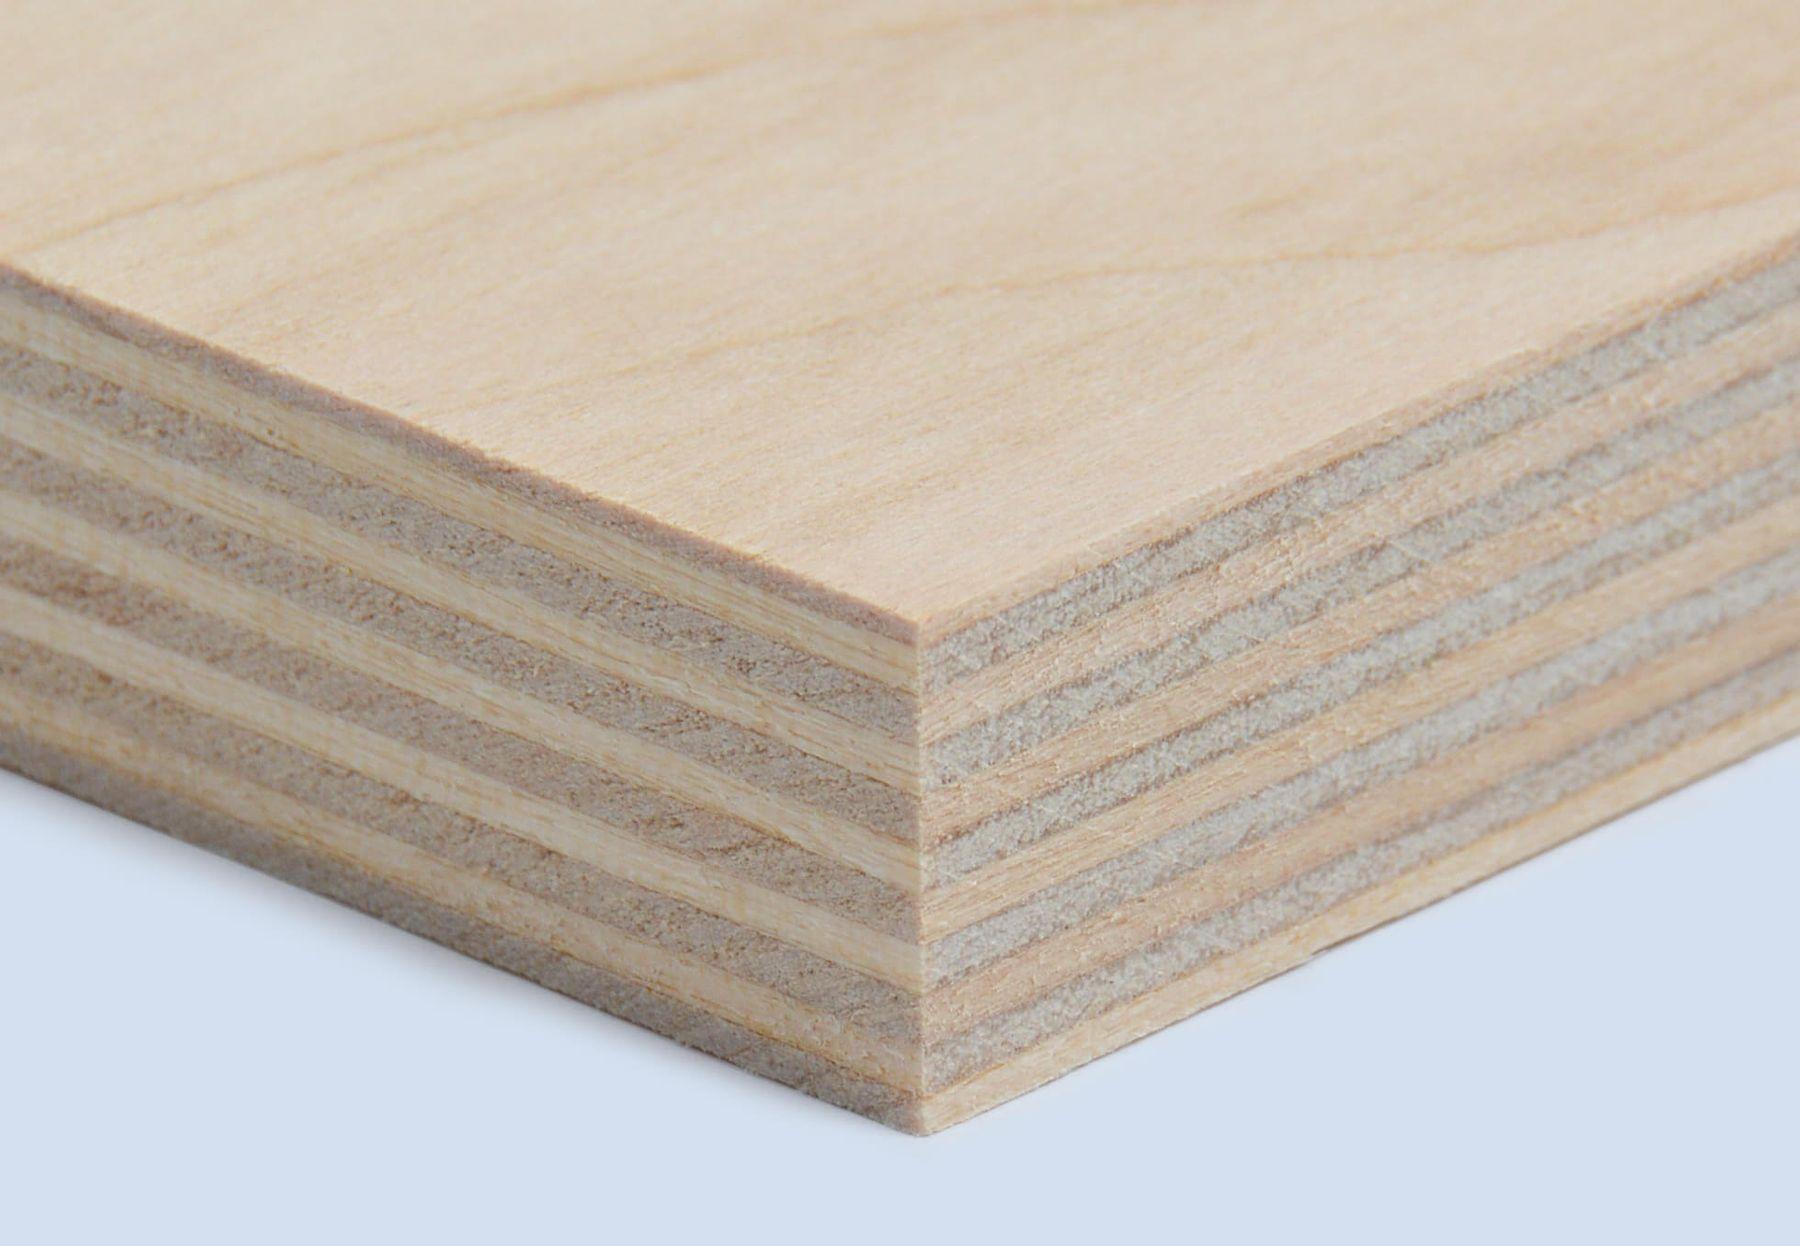 Stallmann Design Sperrholz-Platte 10x40 5mm St/ärke Multiplex Zuschnitt Birke Qualit/ät B//BB Holzplatte f/ür Regalb/öden oder zum basteln Laubs/äge-Holz Bastelholz